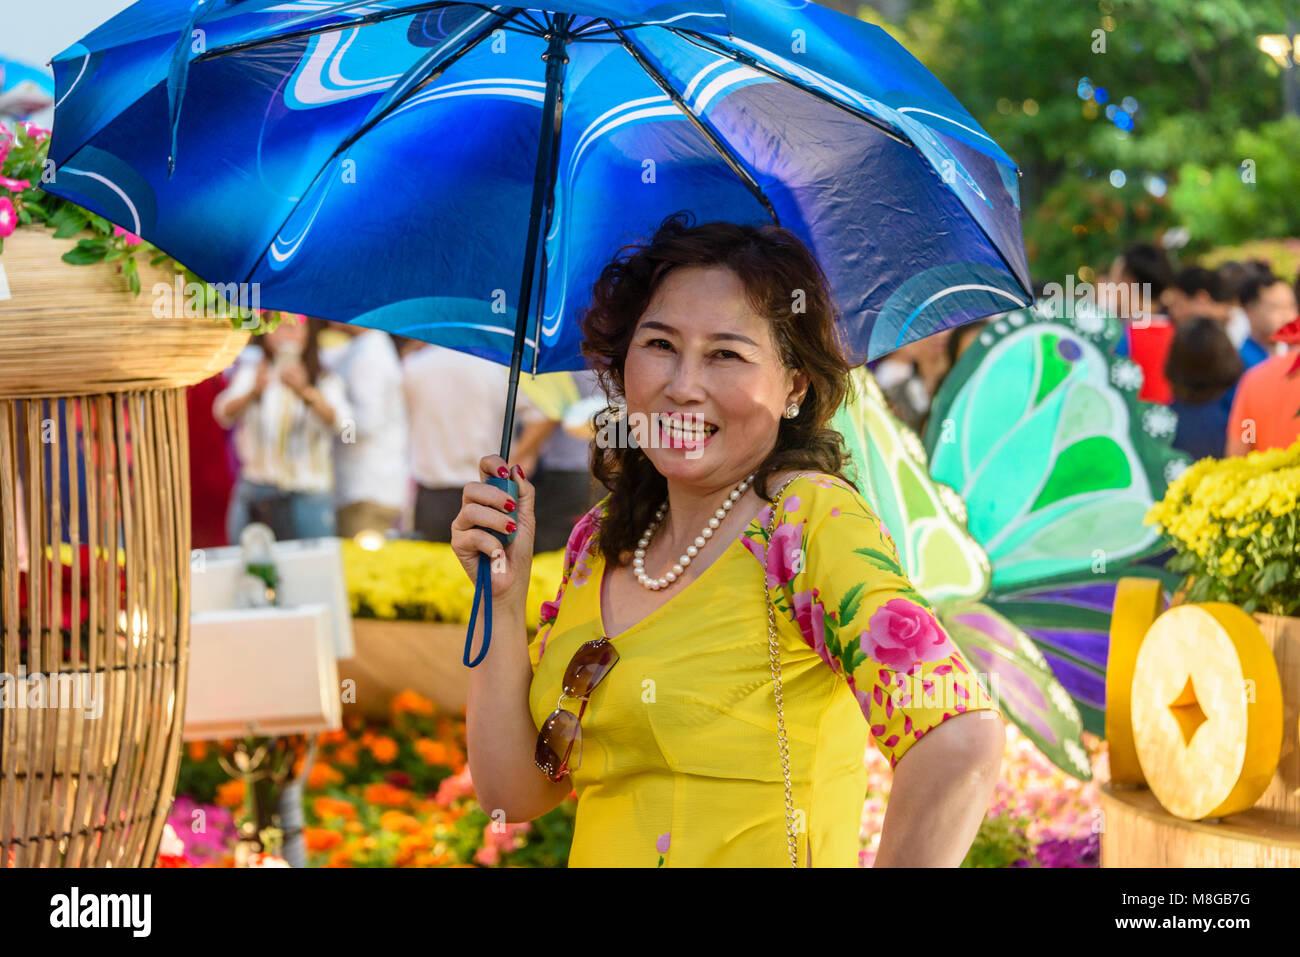 A Vietnamese woman wearing a yellow dress and holding a blue parasol, Ho Chi Minh City, Saigon, Vietnam Stock Photo